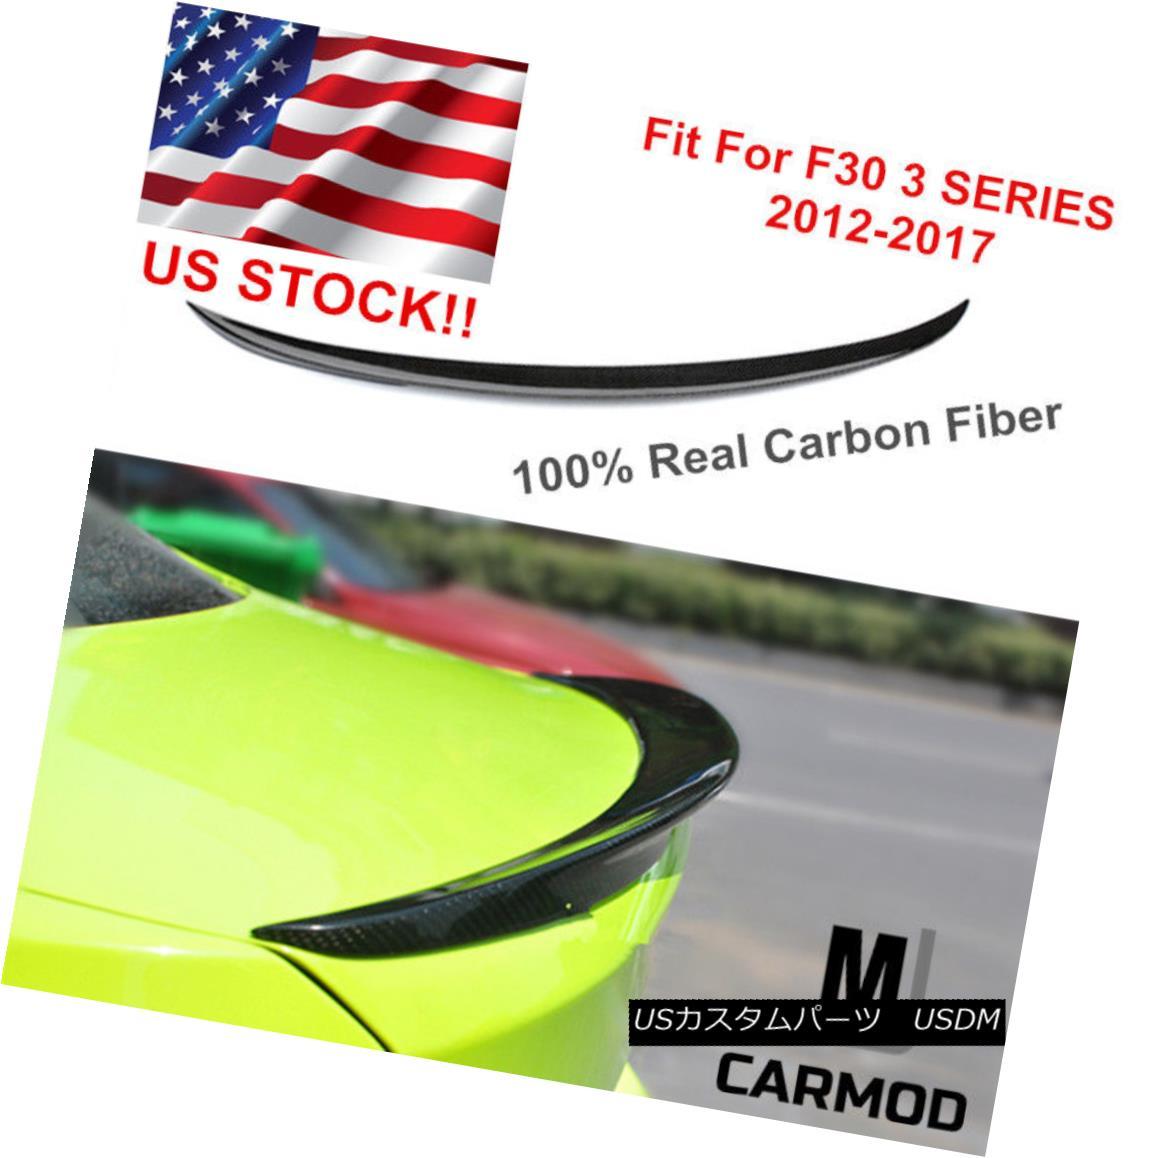 Carbon Fiber Trunk Lip Wing Spoiler Fit For F30 3-Series 335i 330 /& F80 M3 Sedan